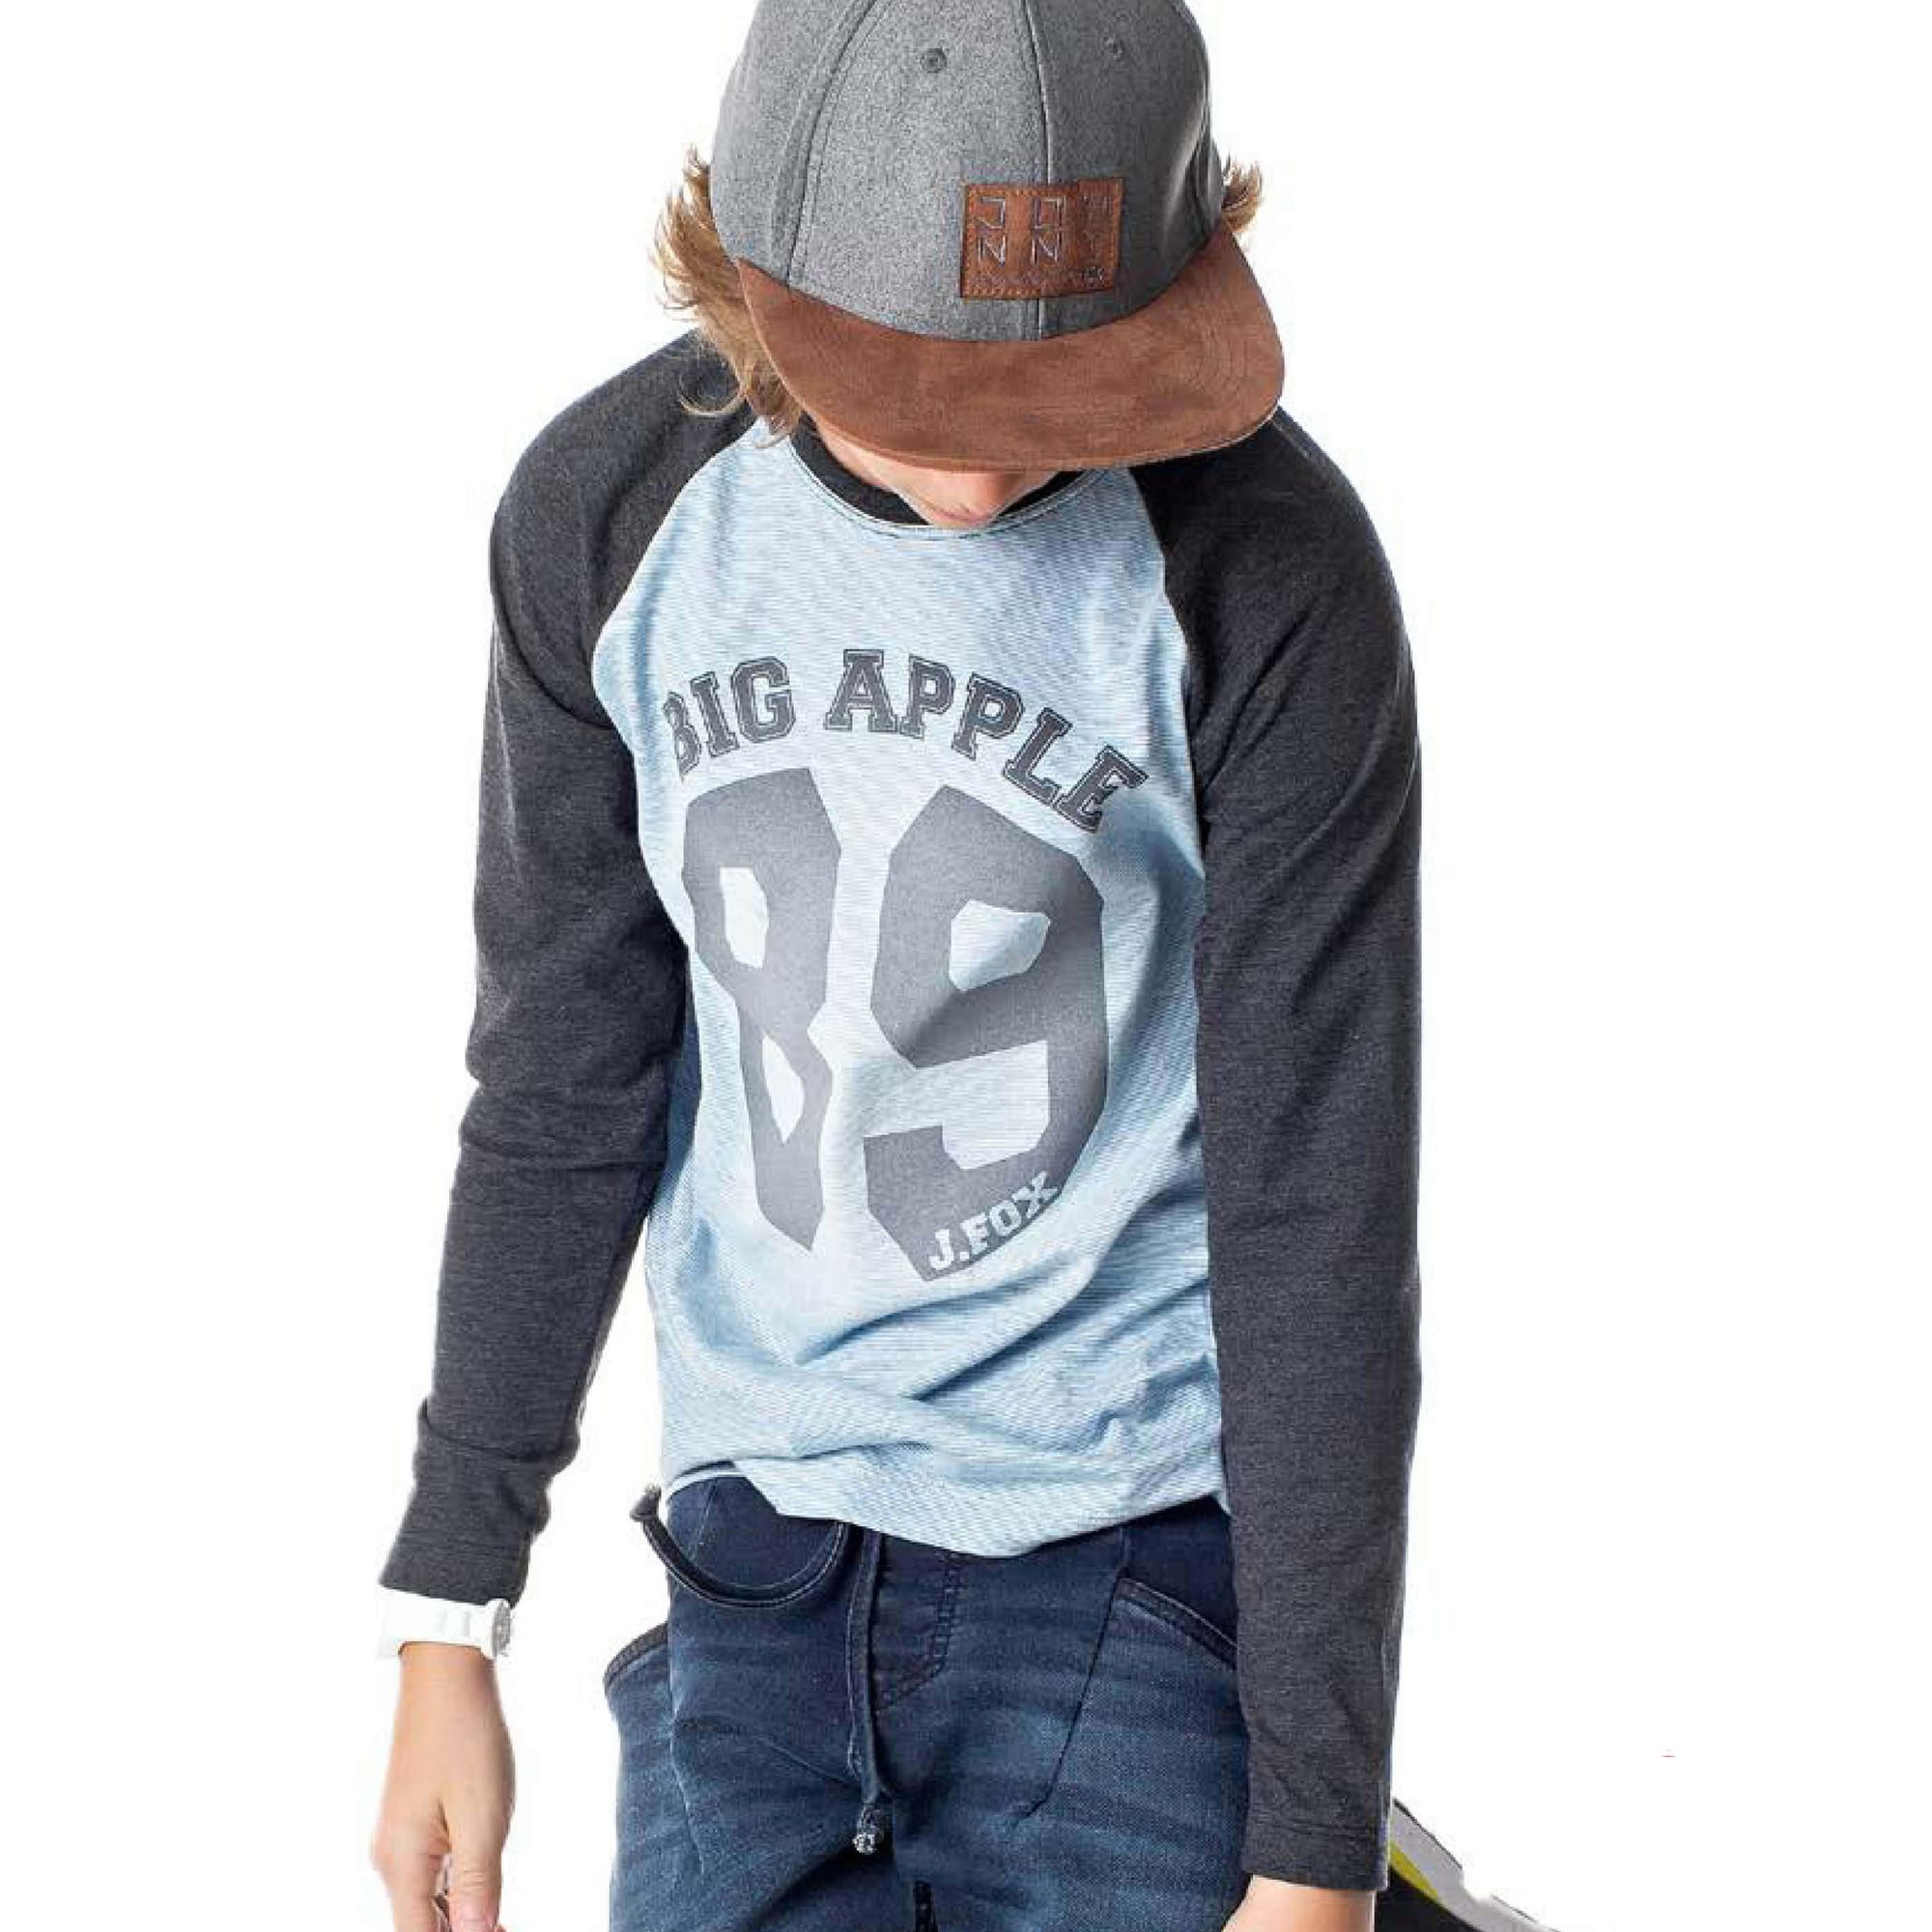 Camiseta Infantil Menino Manga Longa Big Apple - Johnny Fox - EcaMeleca 0c236951556